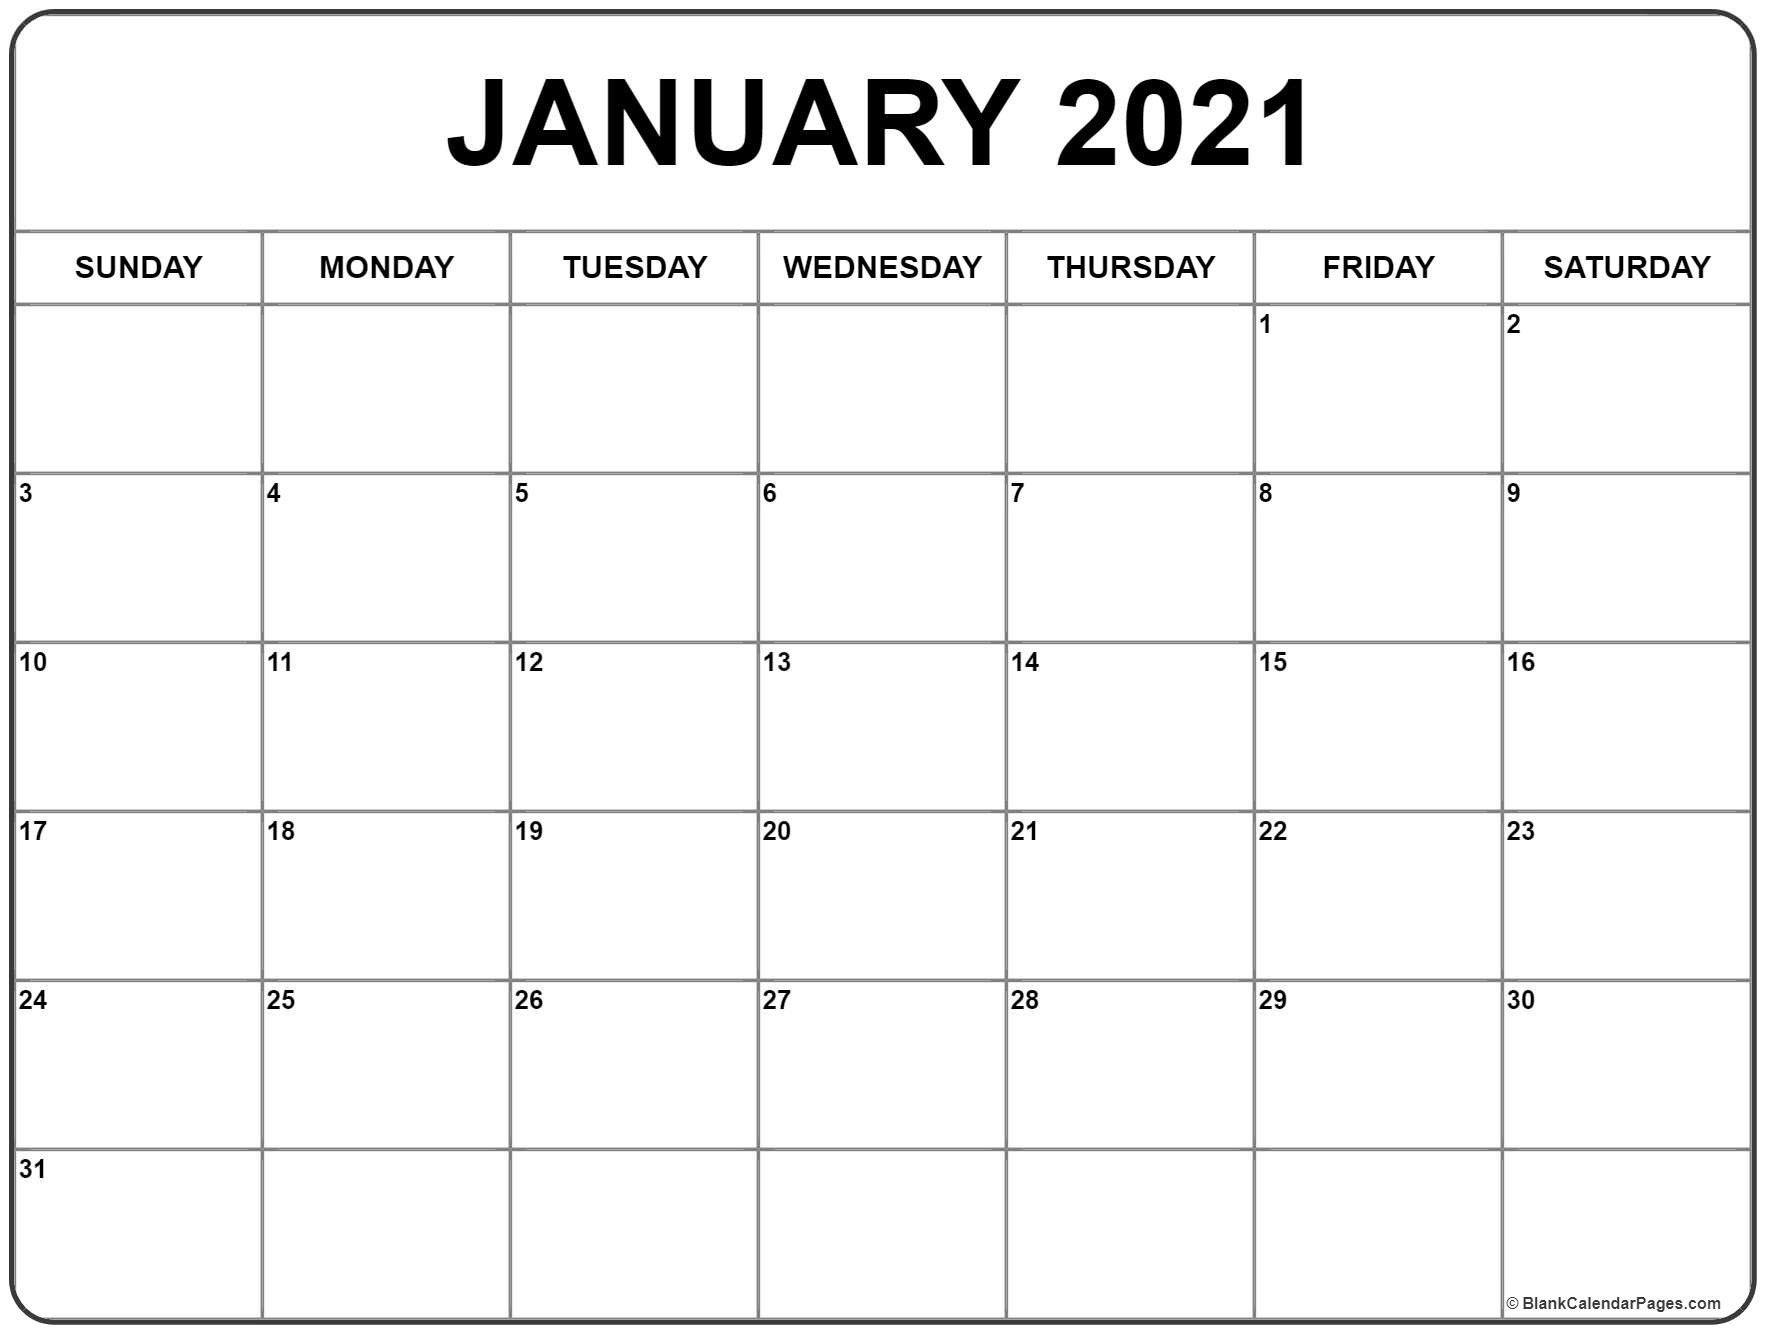 January 2021 Printable Calendar In 2020 | Monthly Calendar